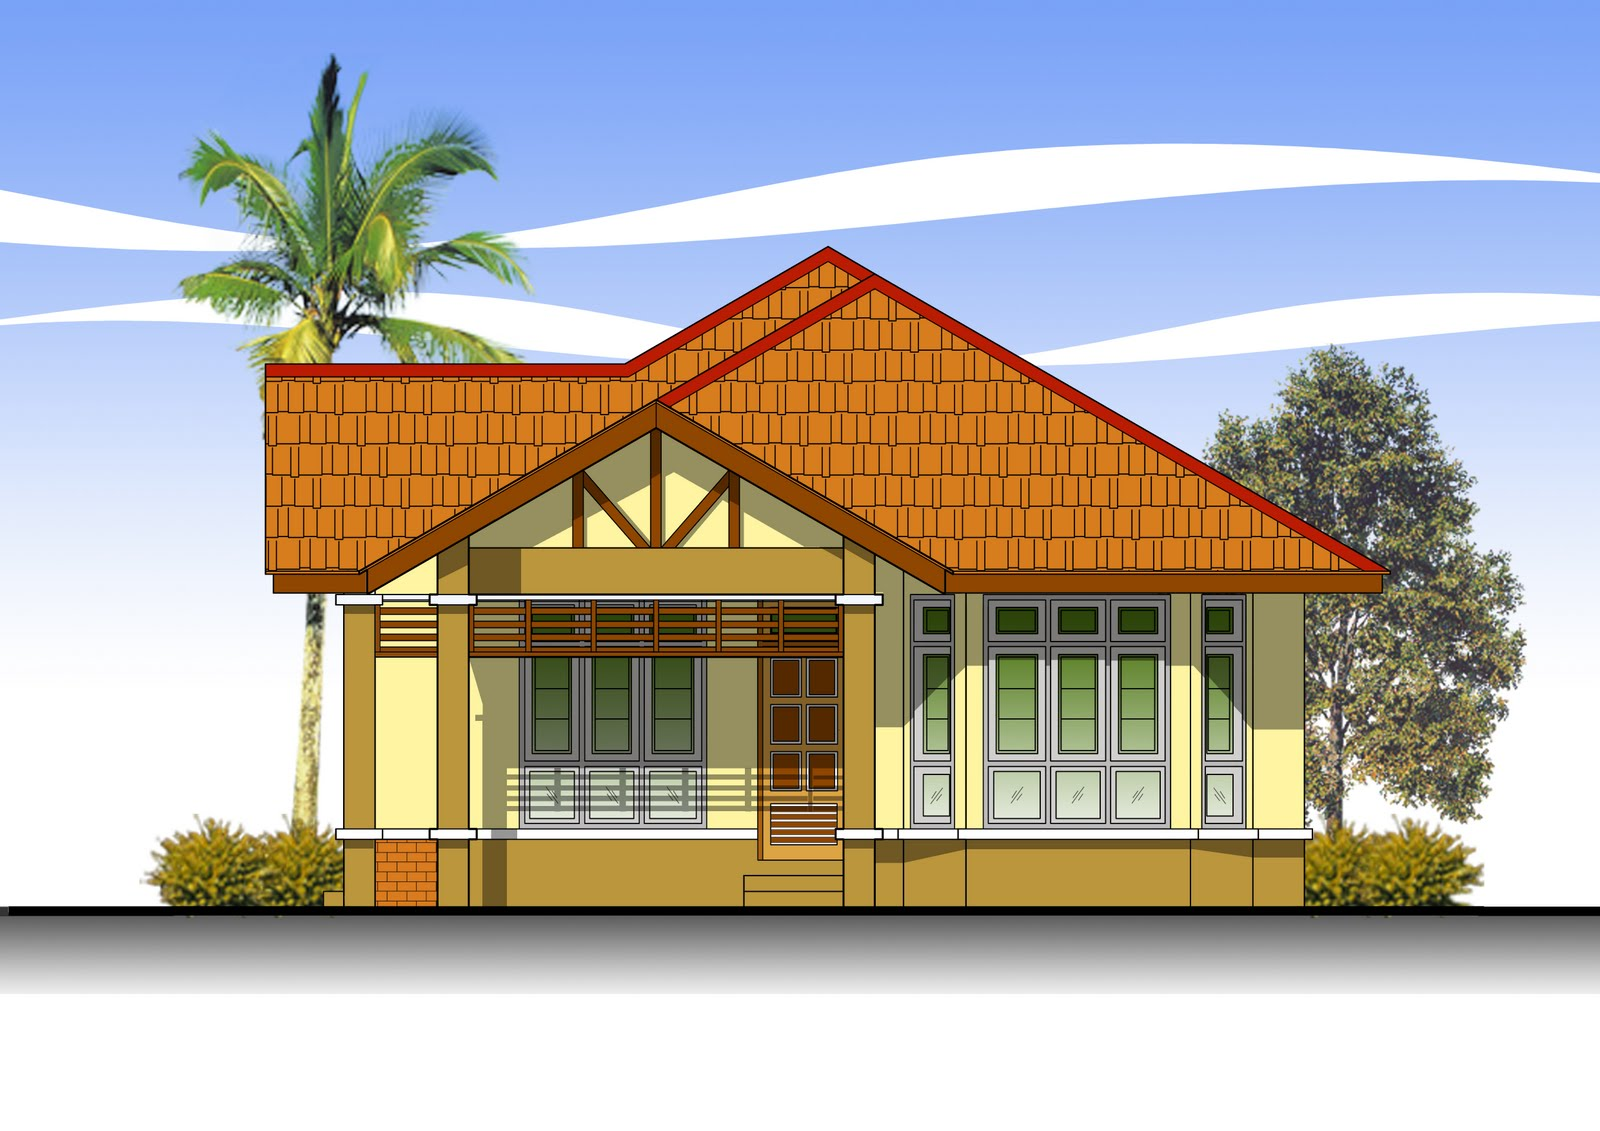 Of Model Rumah Banglo Setingkat Home Interior Design Ajilbab Portal ...